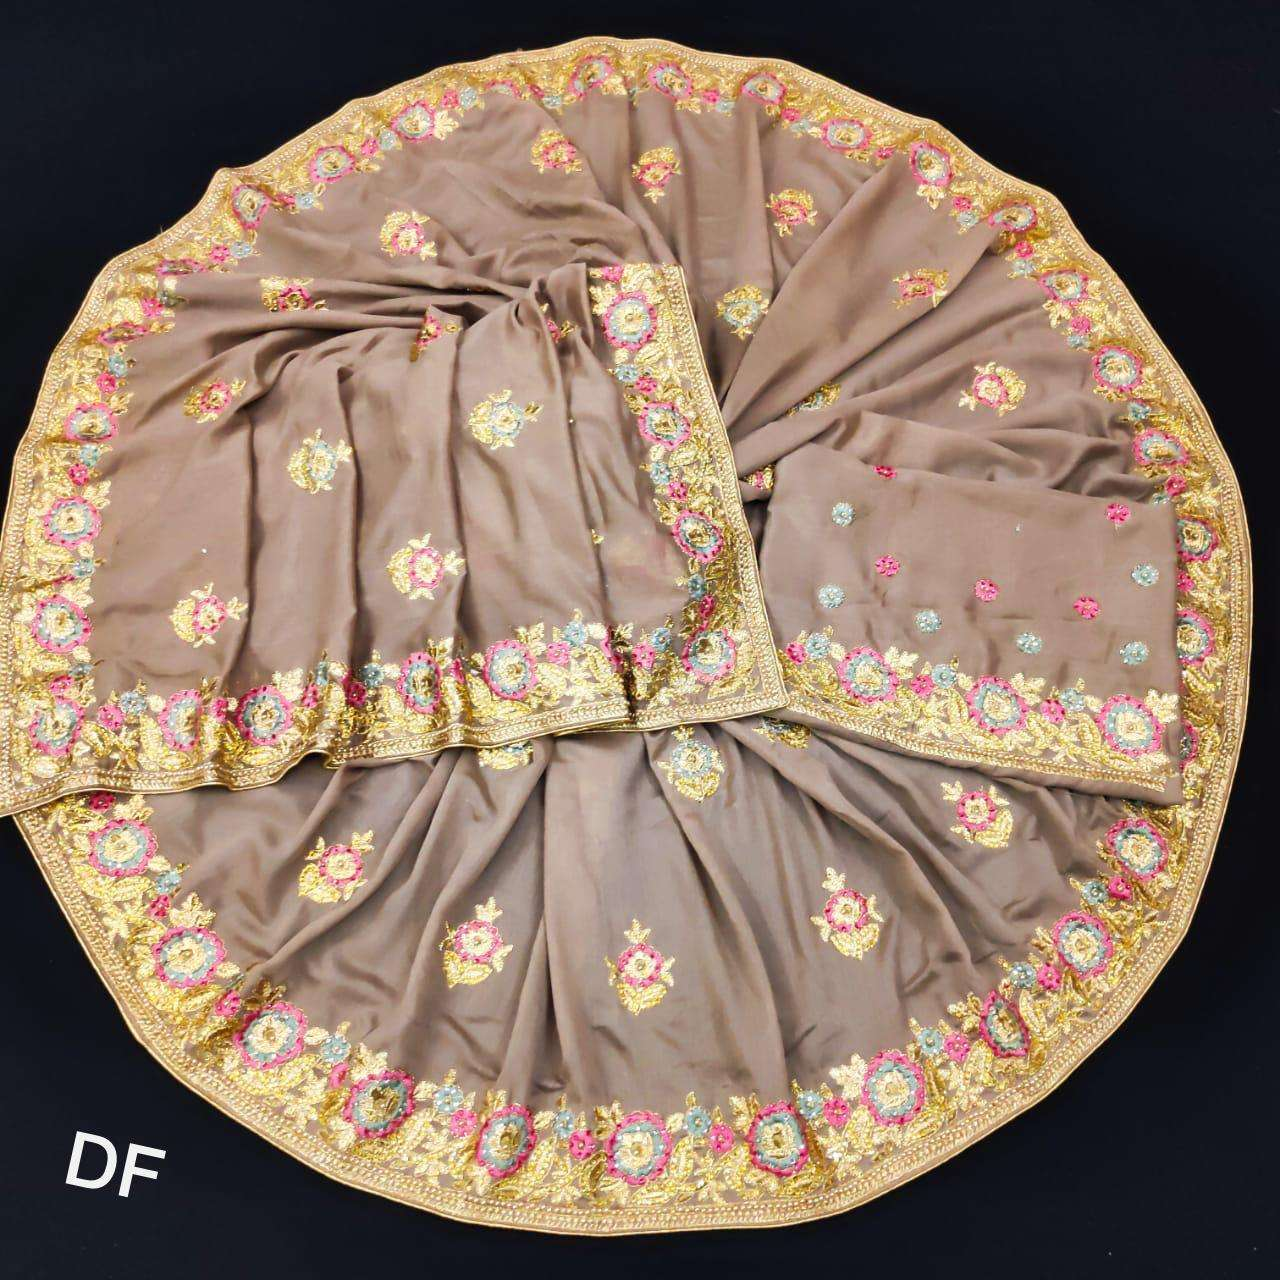 Df 4024 Vichitra Silk Georgette With Multi Embroidery Zari Work Sarees Collection 007